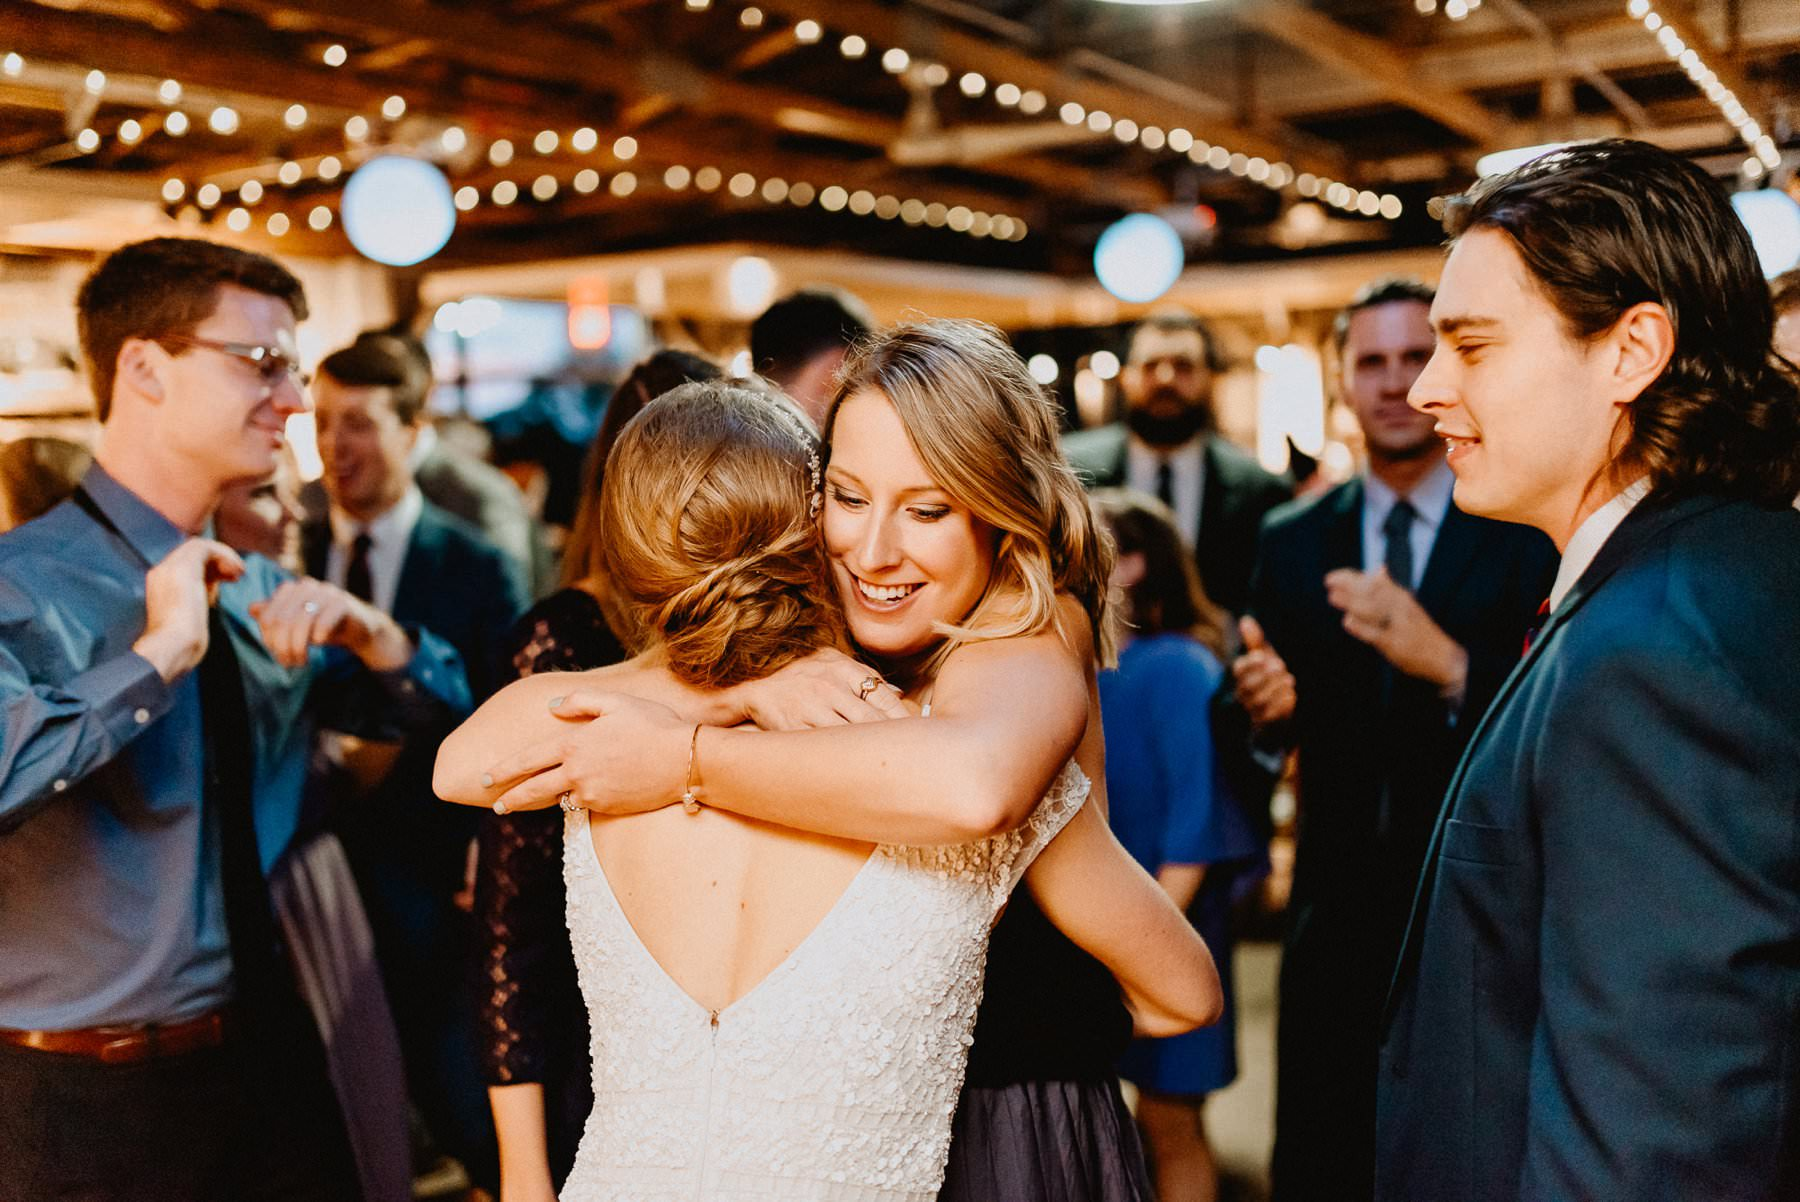 John_James_Audubon_Center_wedding-74.jpg